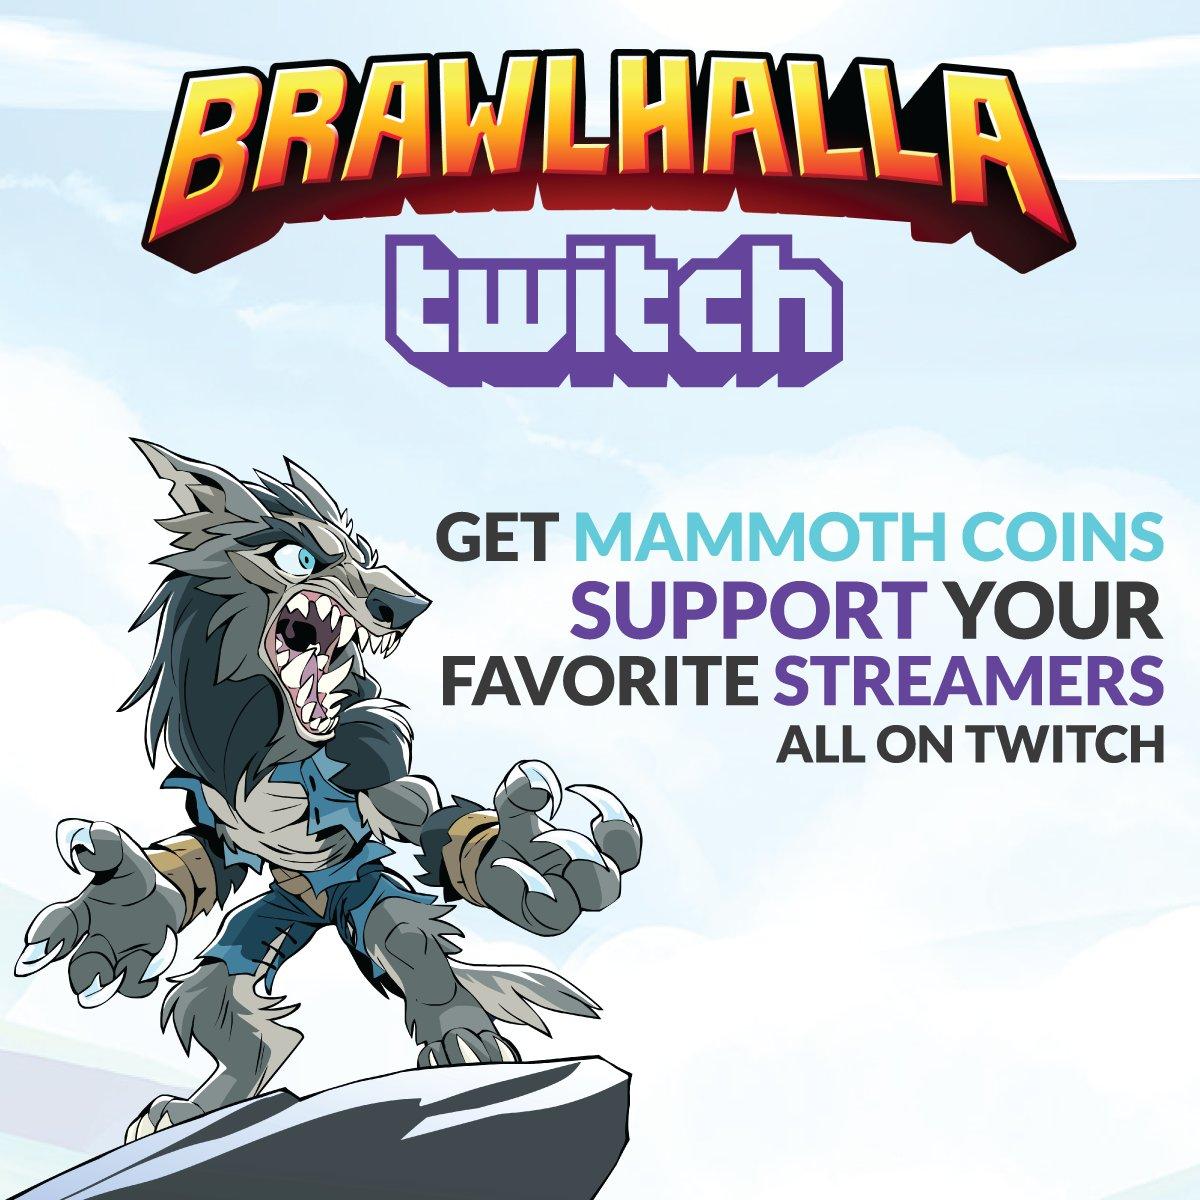 Brawlhalla on Twitter: